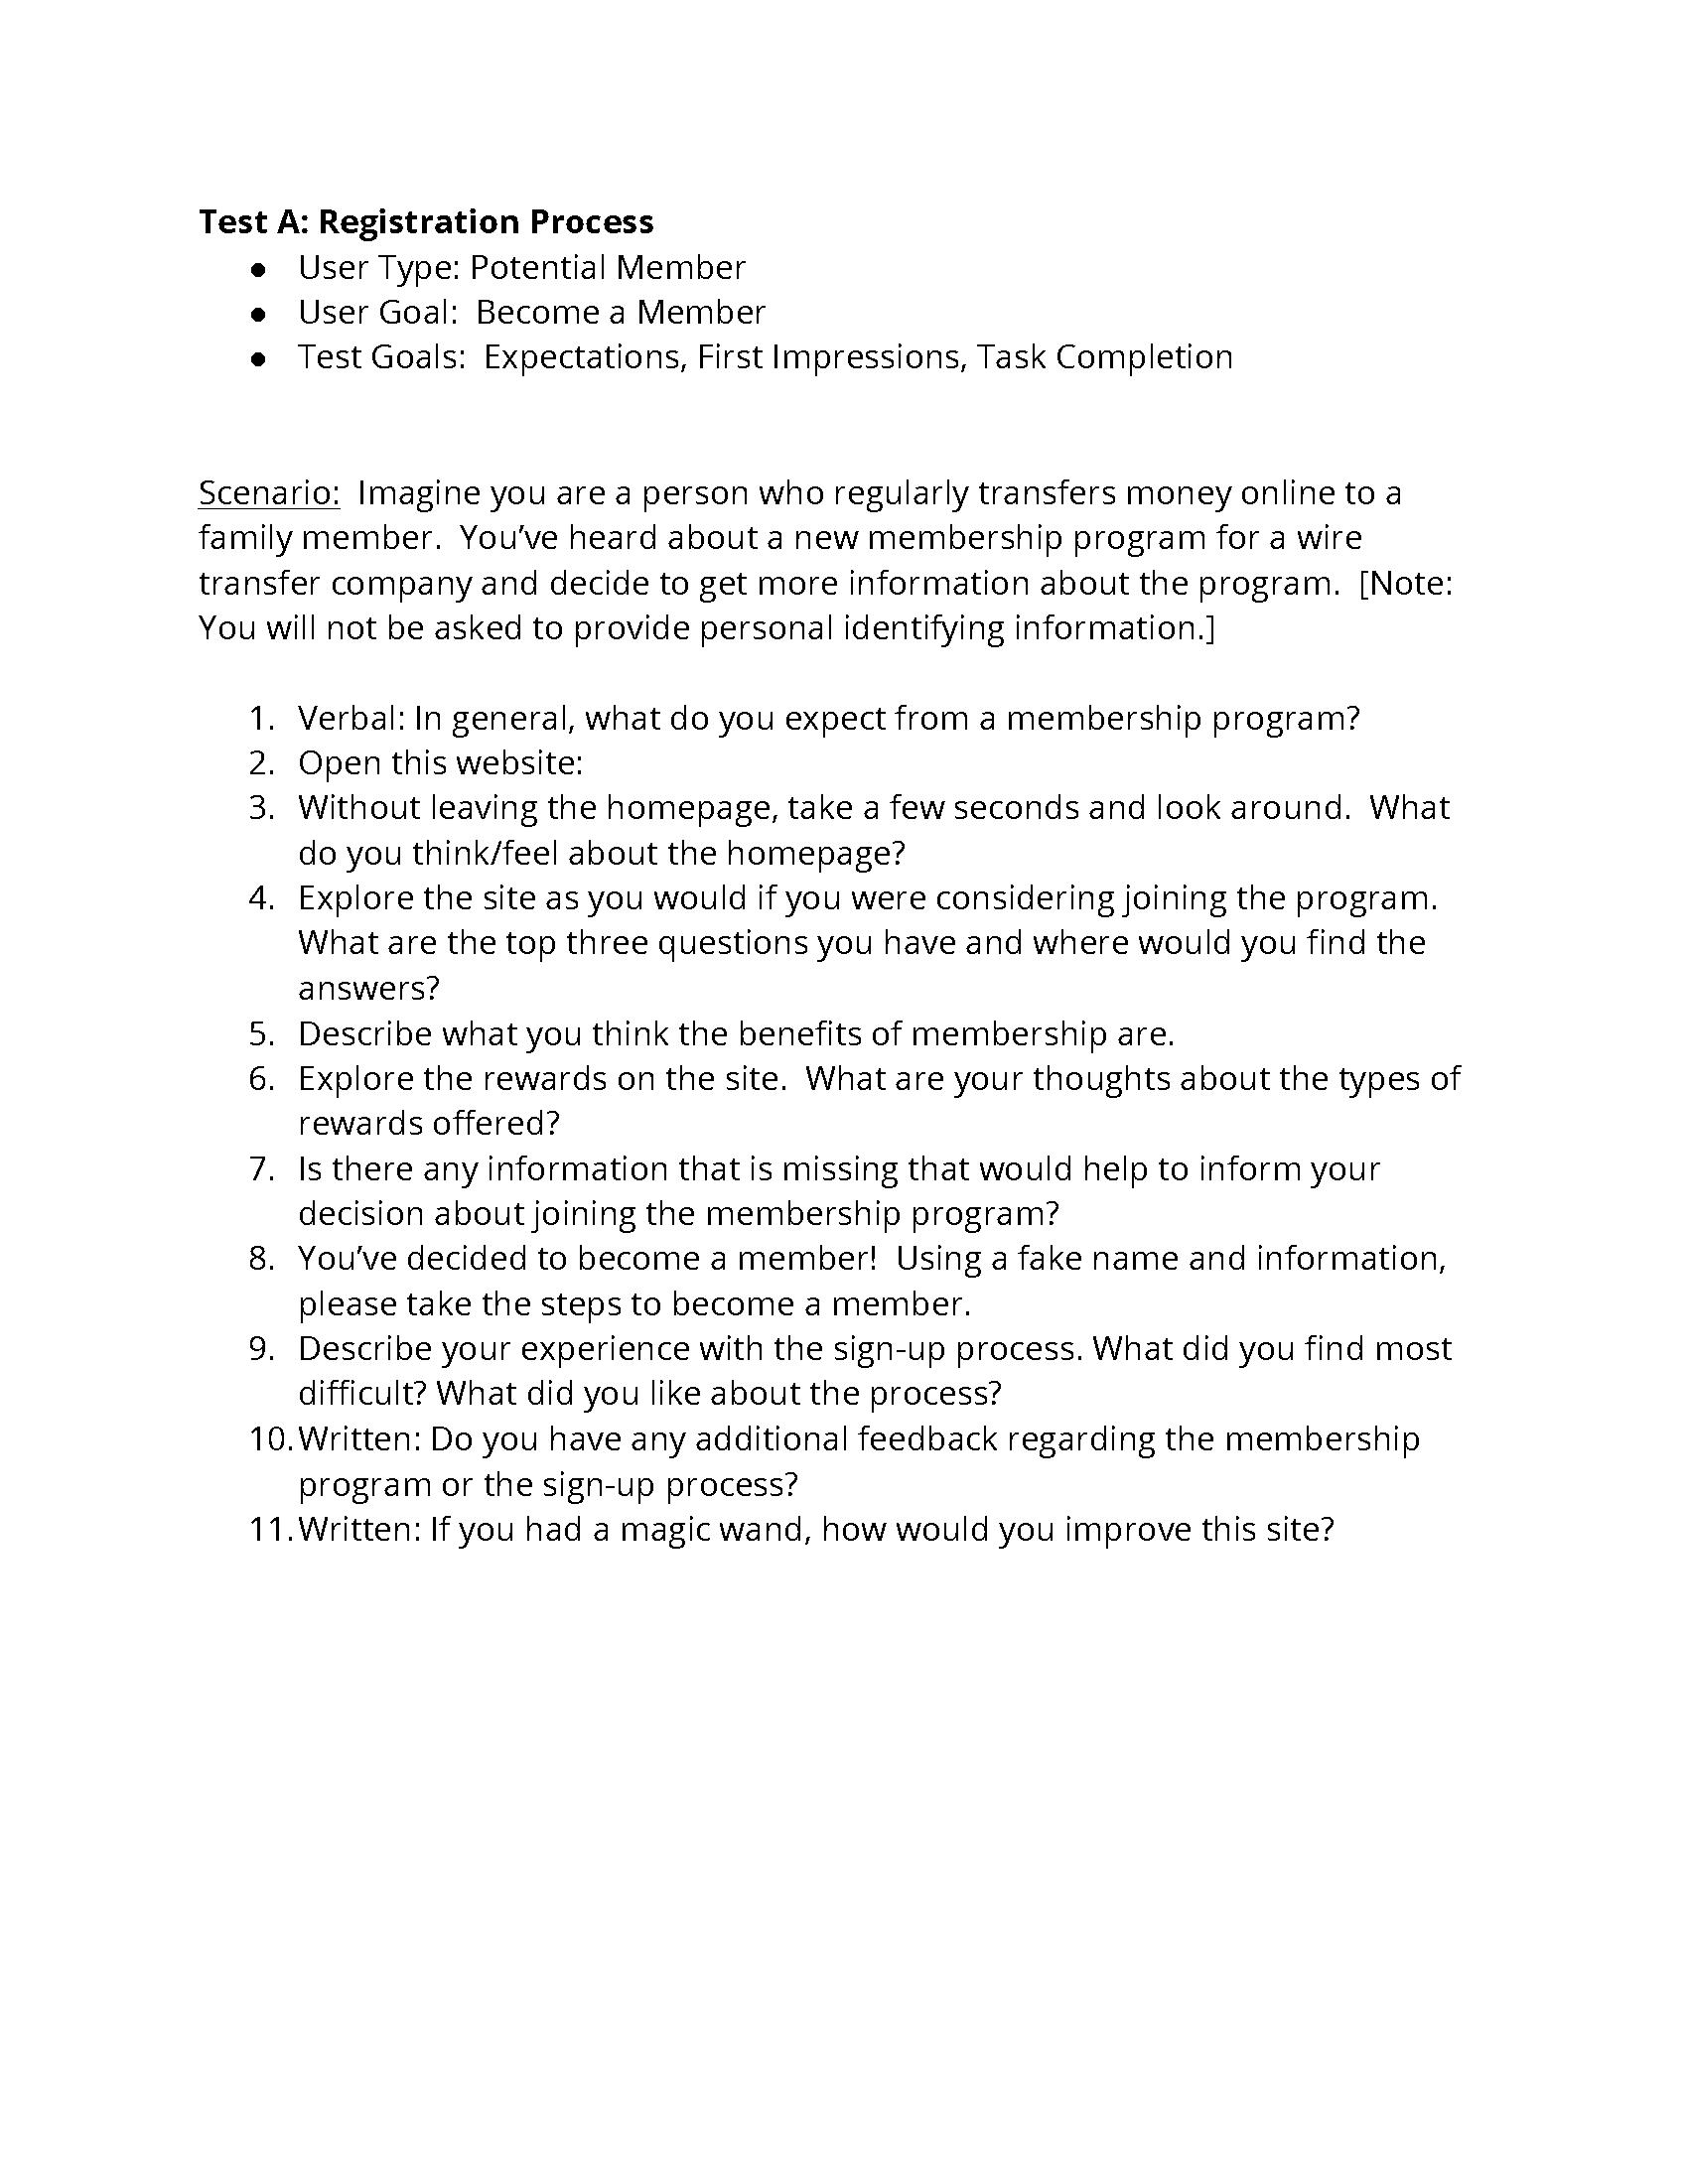 MyWU-UserTestplan Edited_Page_3.png